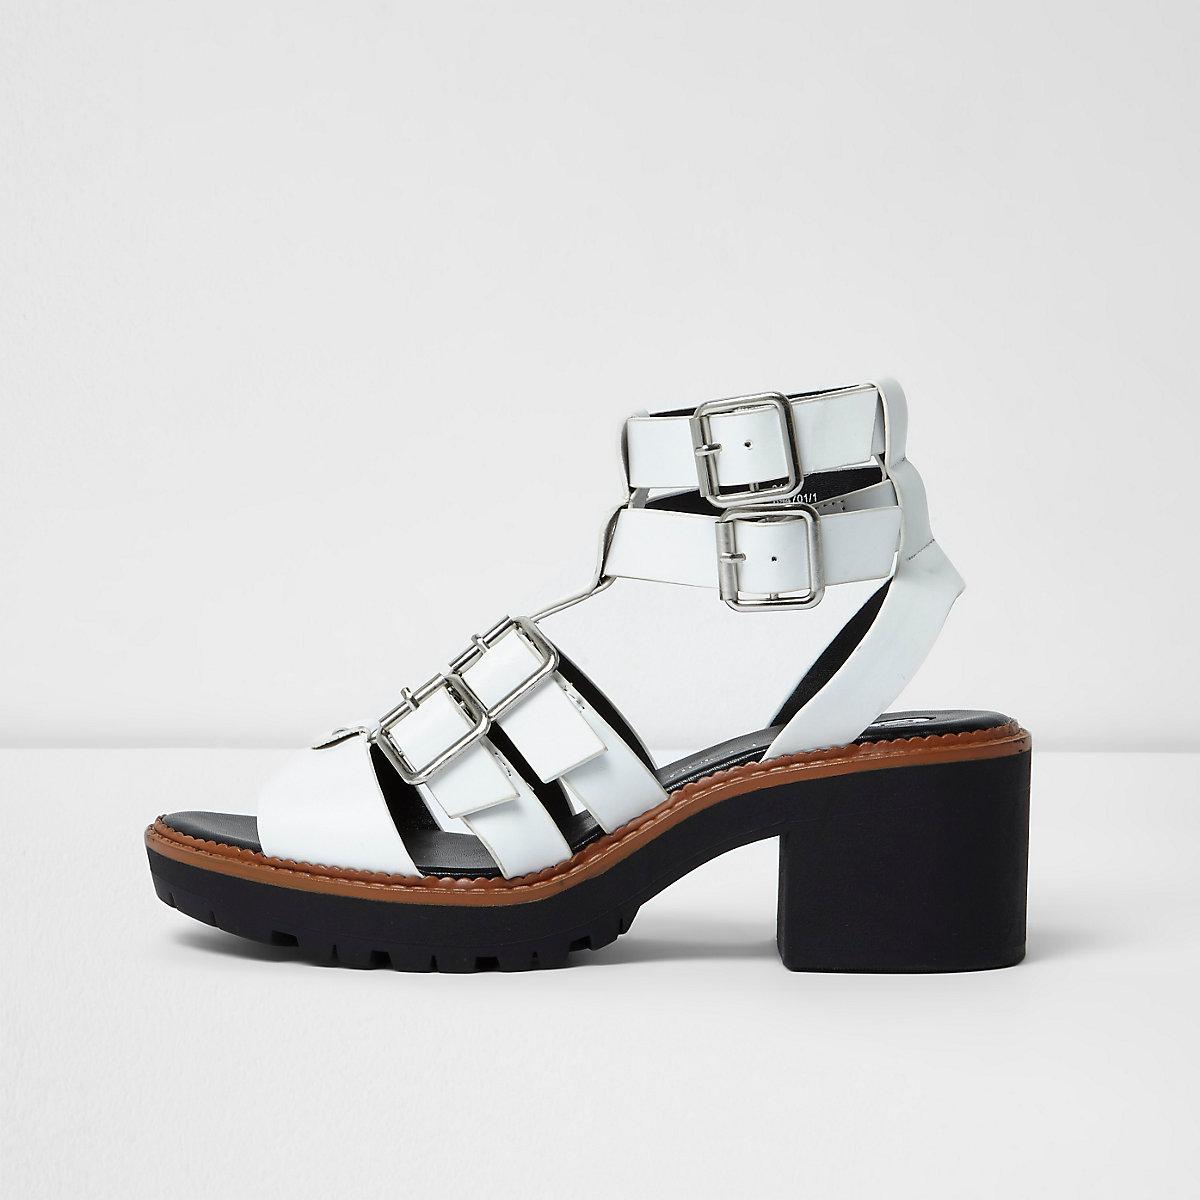 706d03fe0ca White multi buckle strap gladiator sandals - Sandals - Shoes   Boots - women